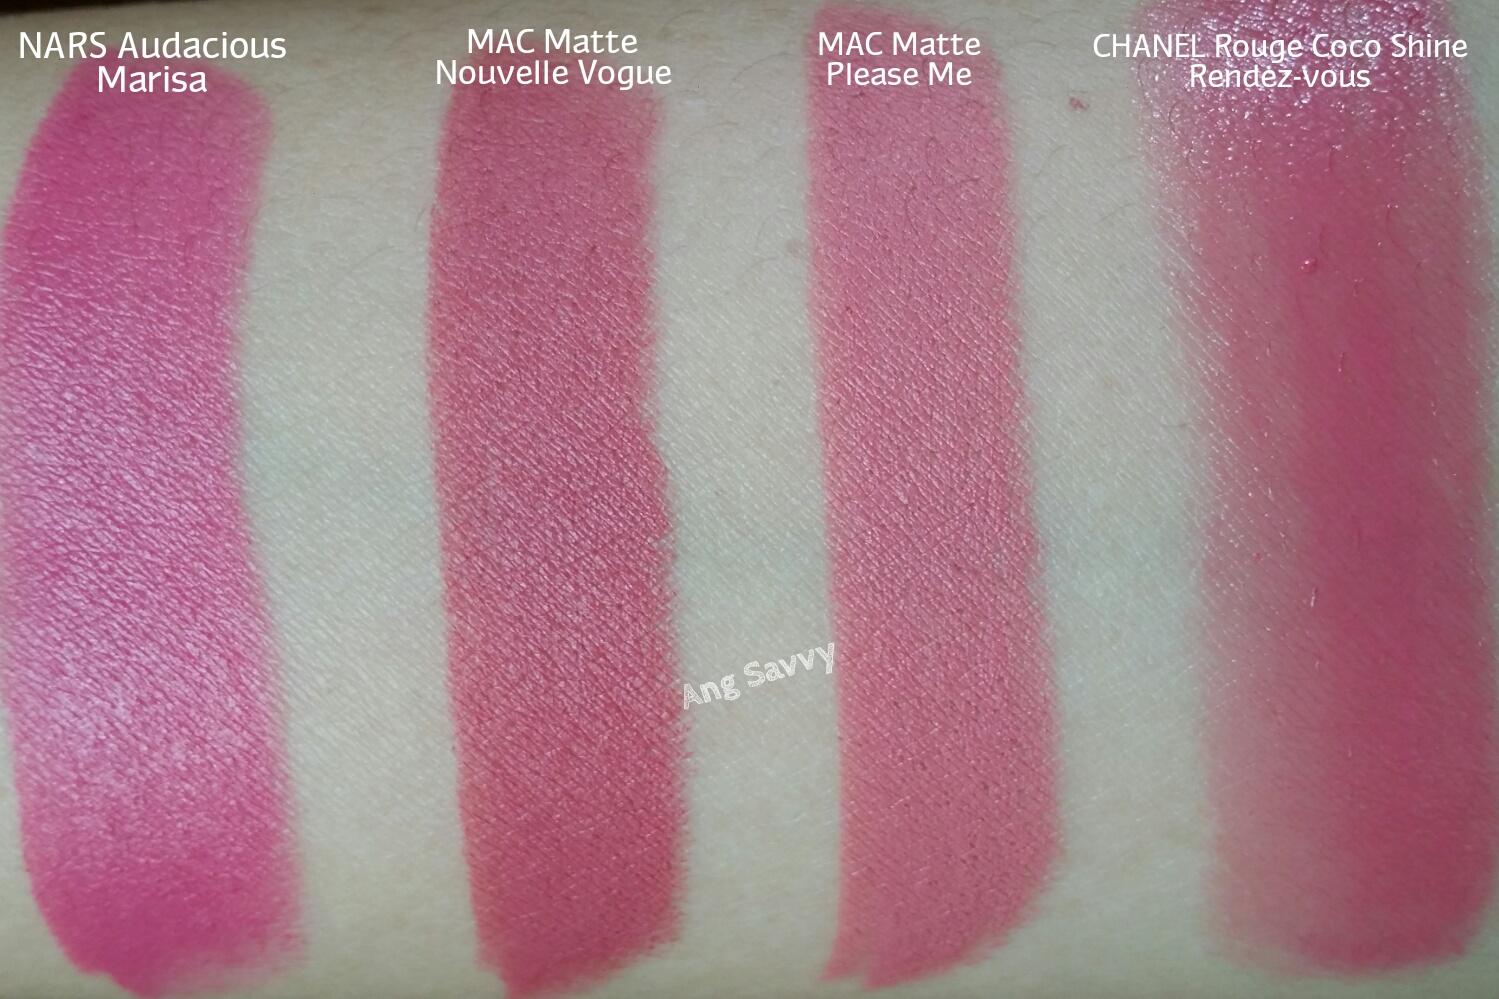 NARS Marisa Audacious Lipstick Swatch